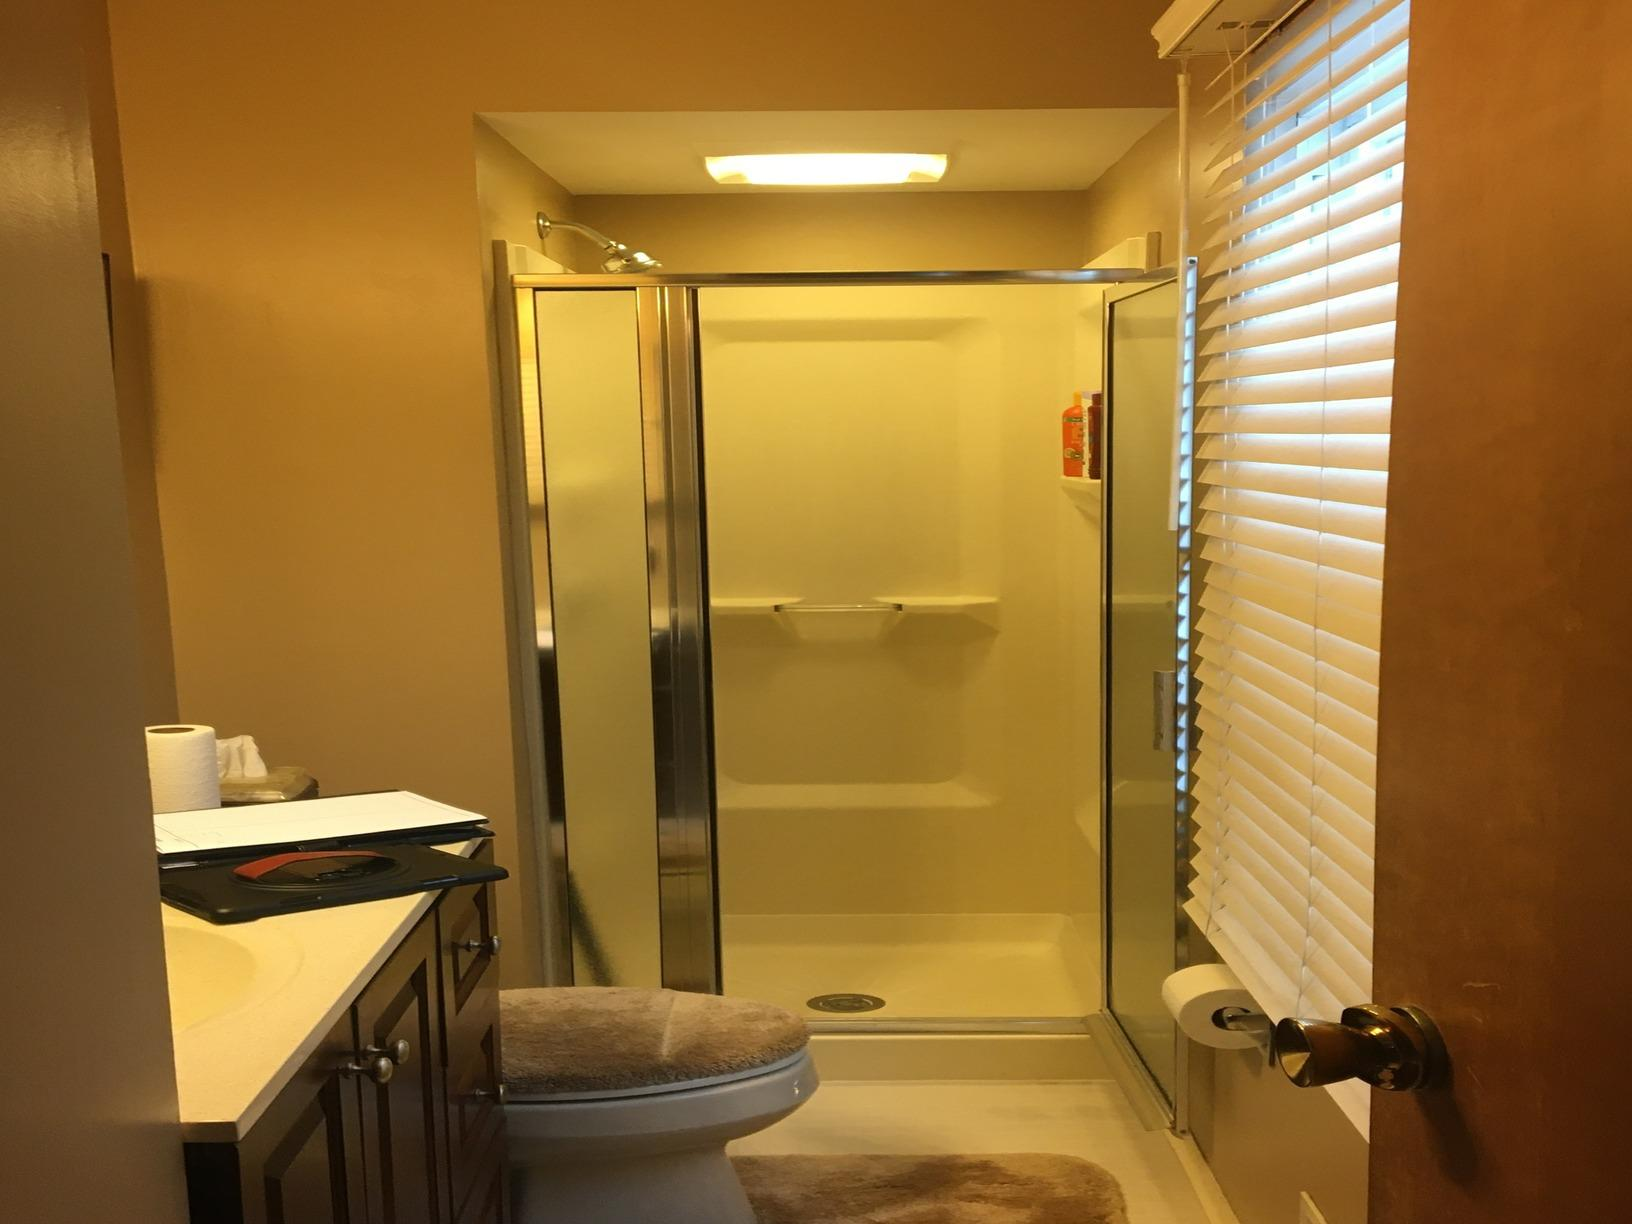 Bathroom Remodel- Toledo OH Walk-in Shower Update - Before Photo